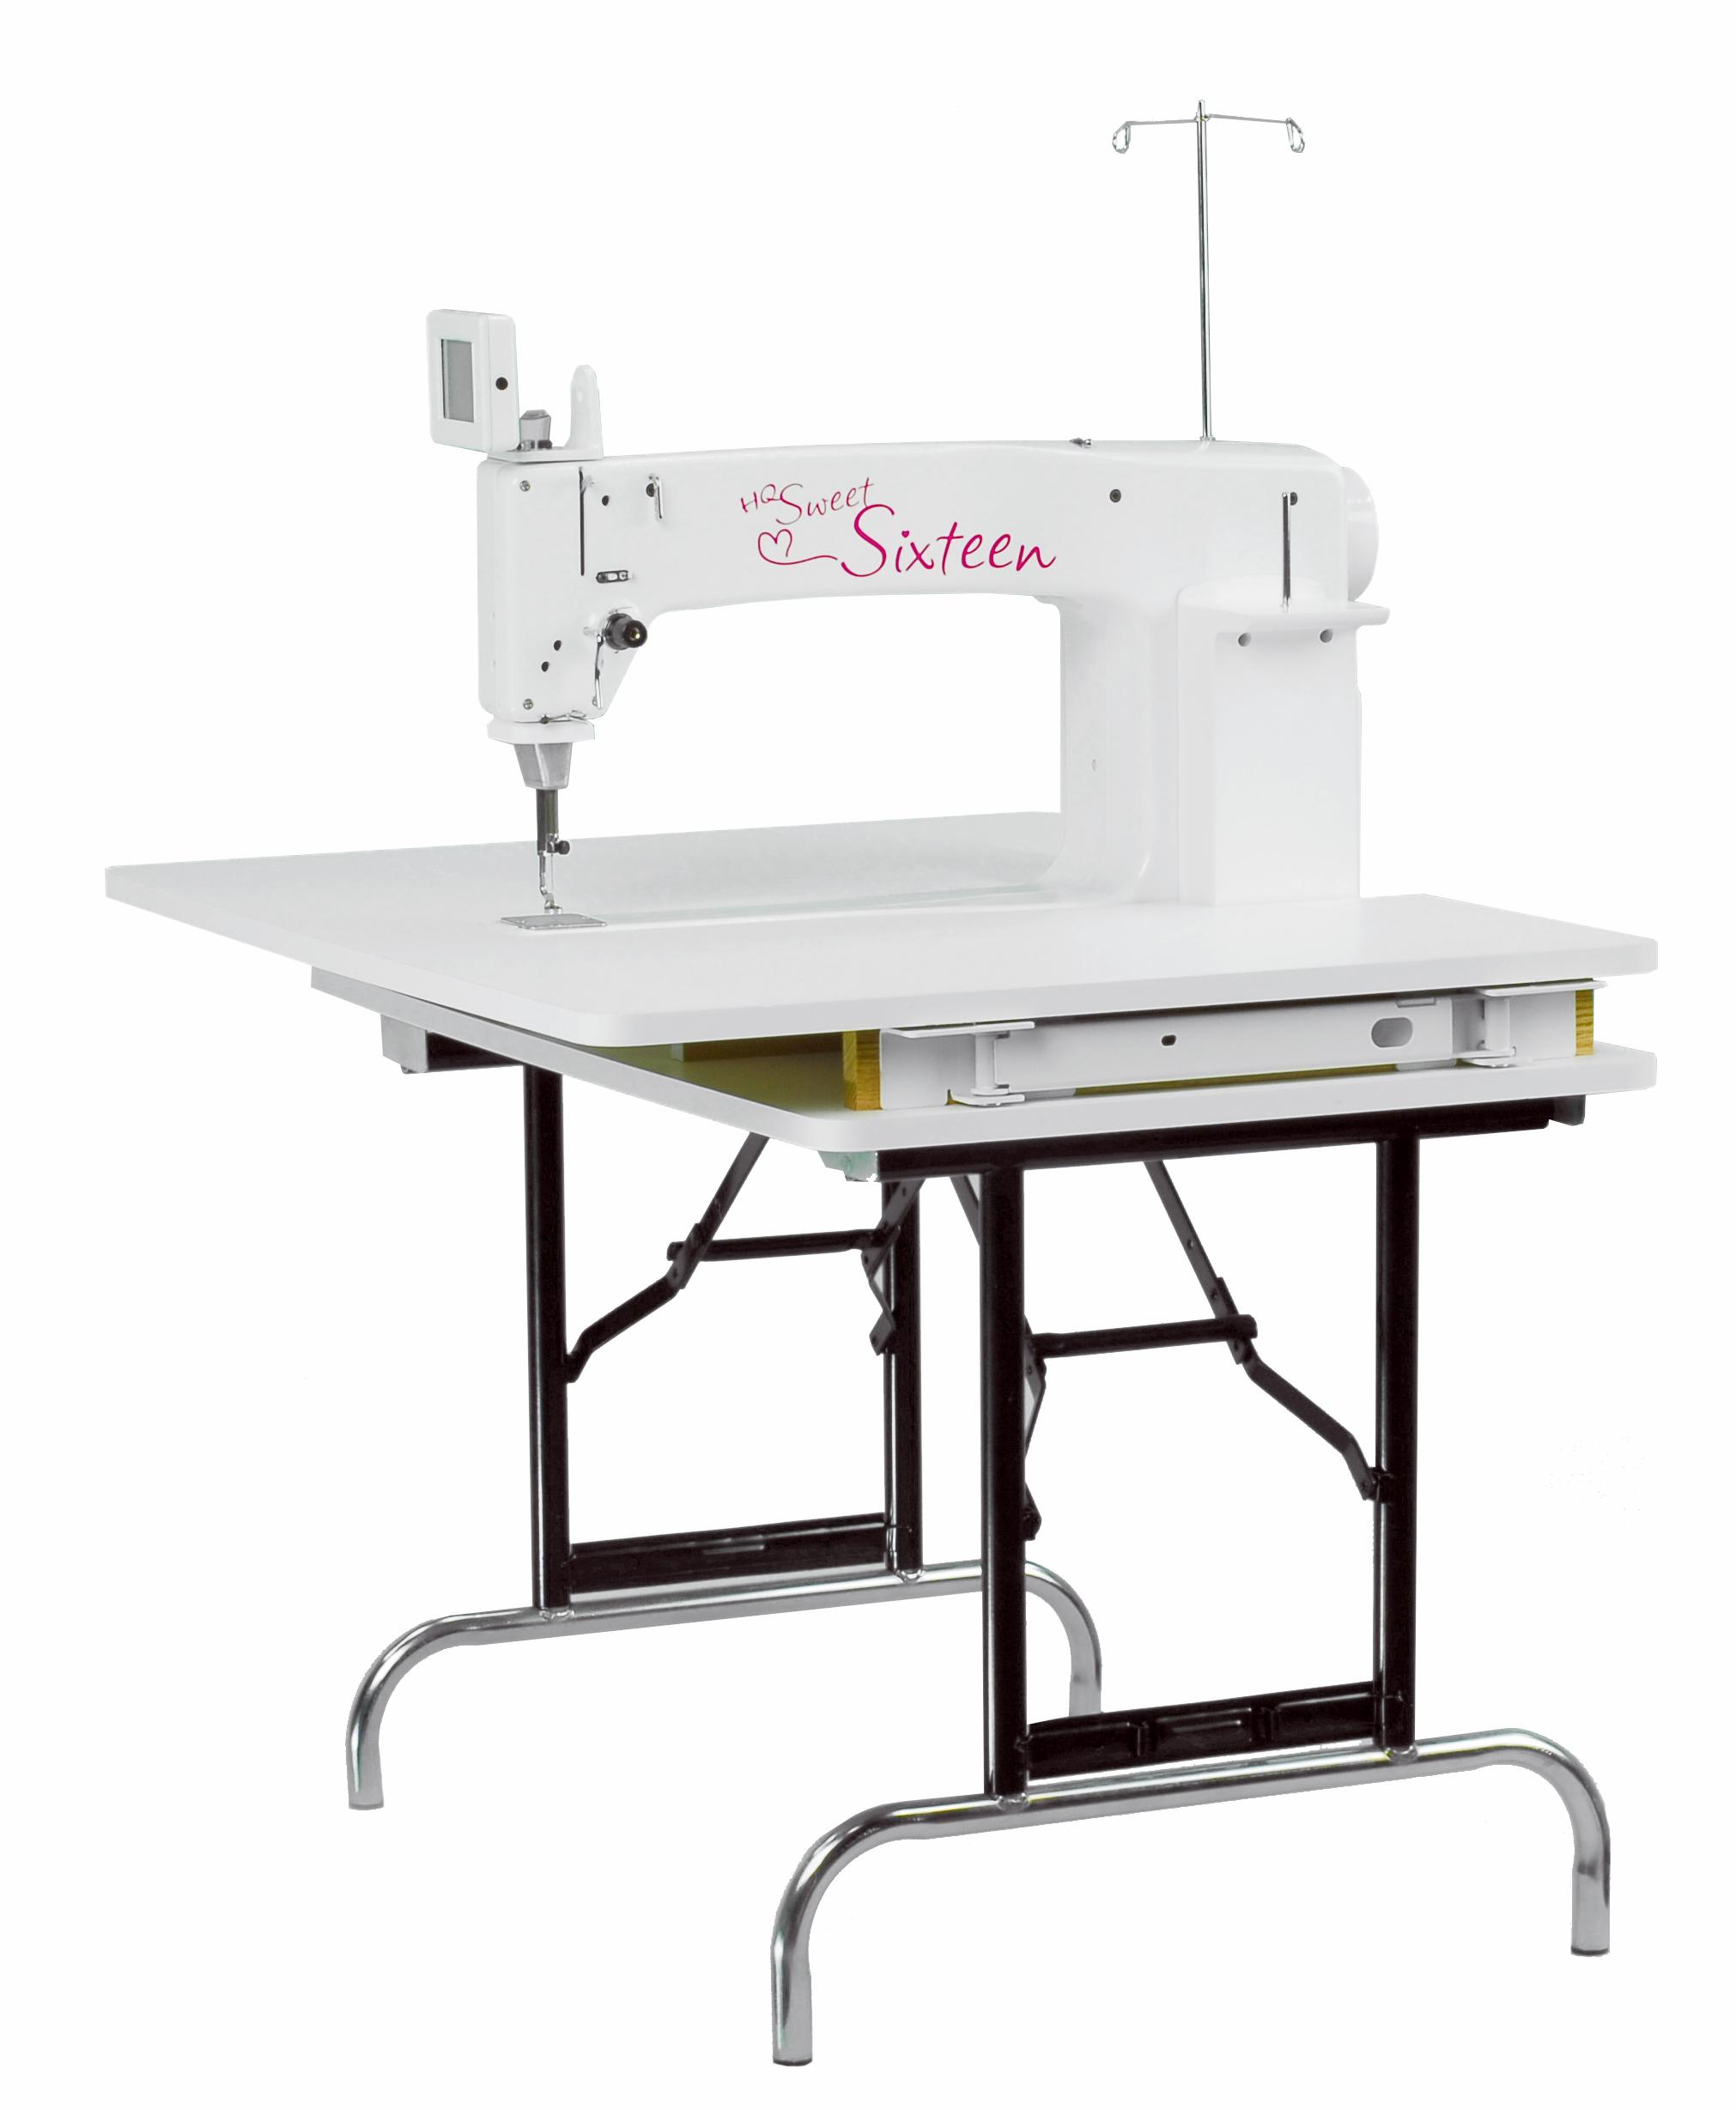 Hq Sweet Sixteen Sitdown Longarm Quilting Machine